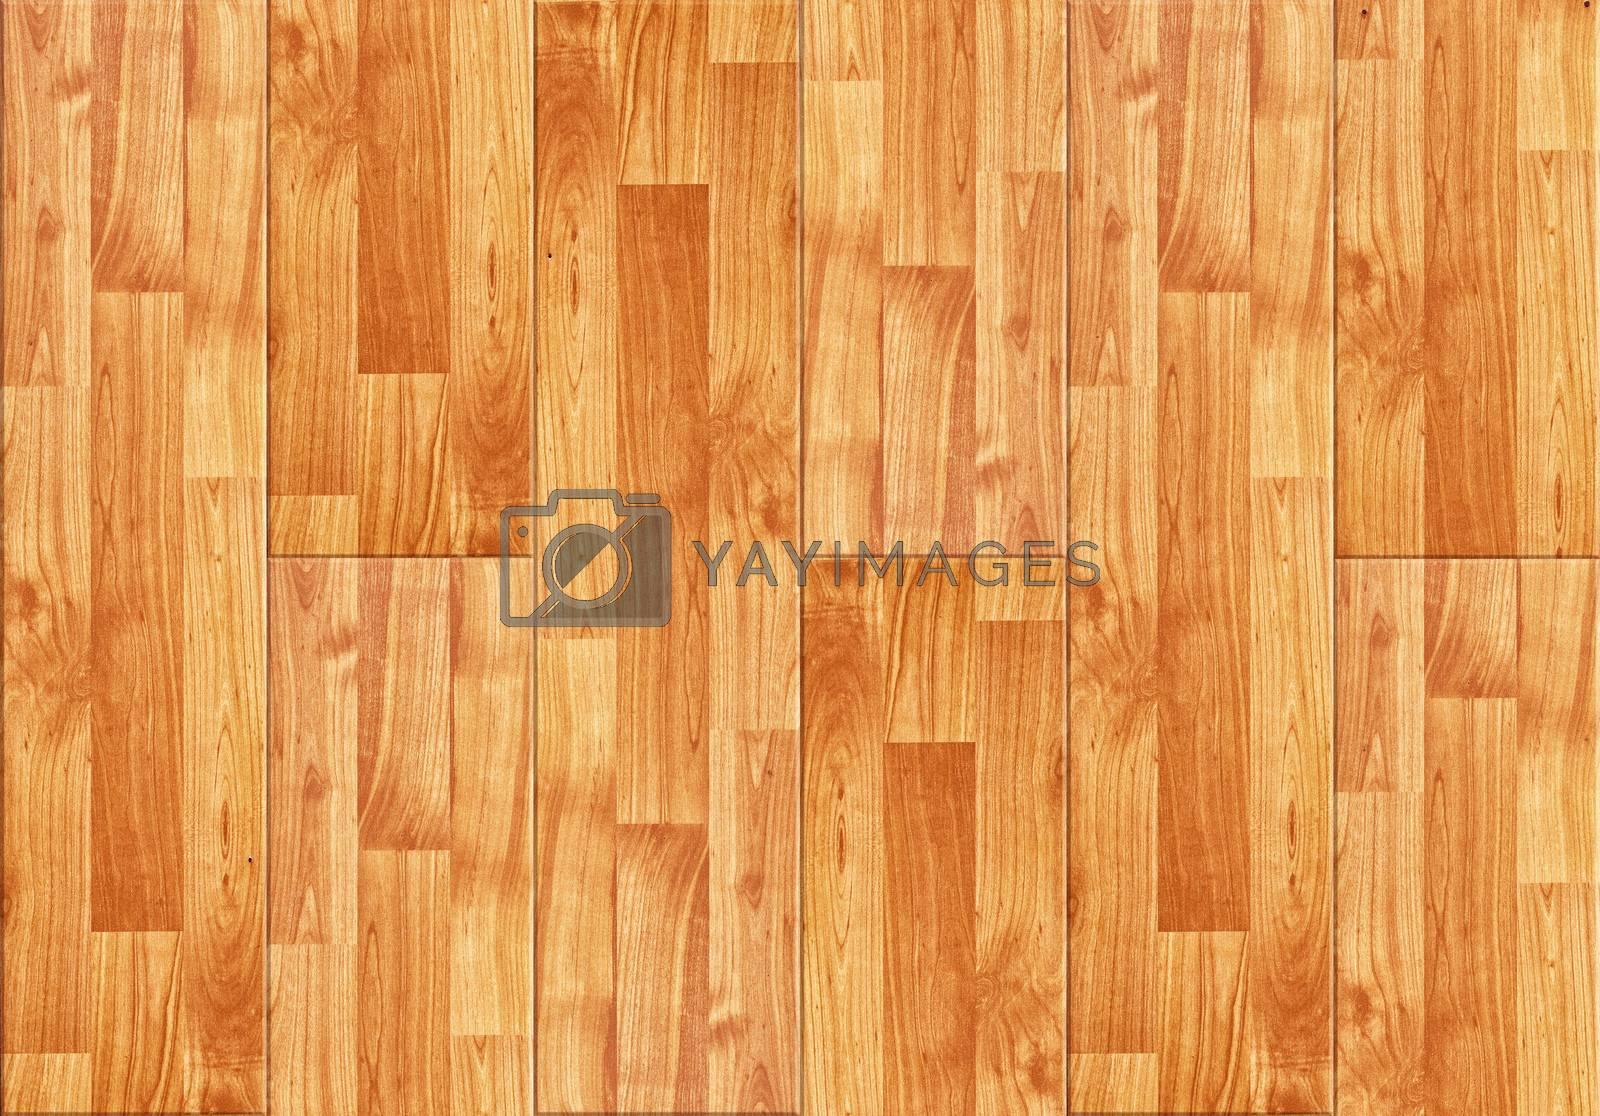 Seamless wood laminated parquet floor texture pattern as interior design background